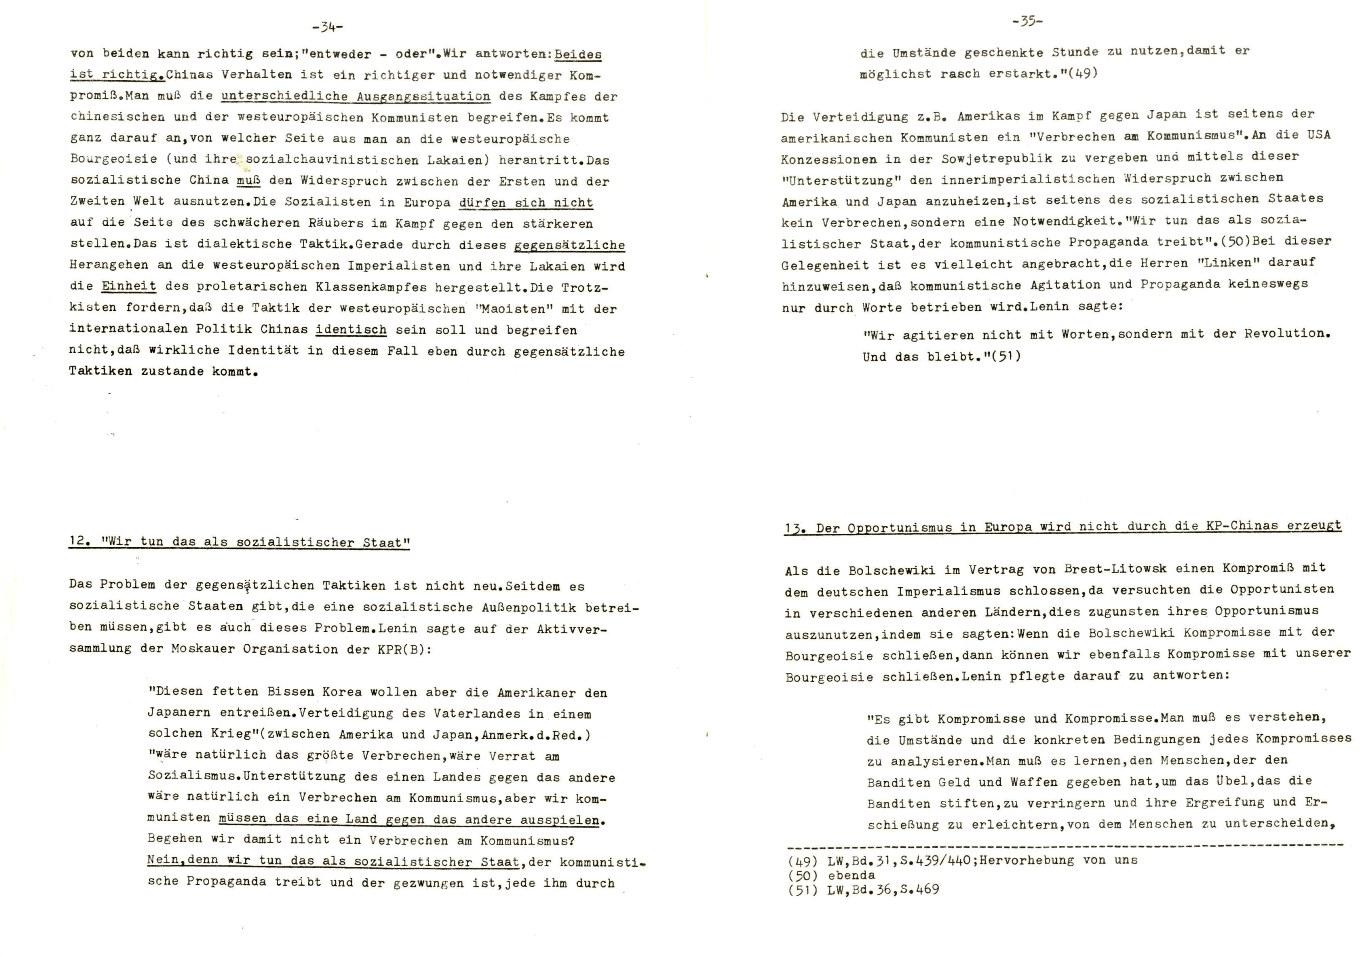 Muenchen_Kampf_dem_Revisionismus_1978_04_05_19